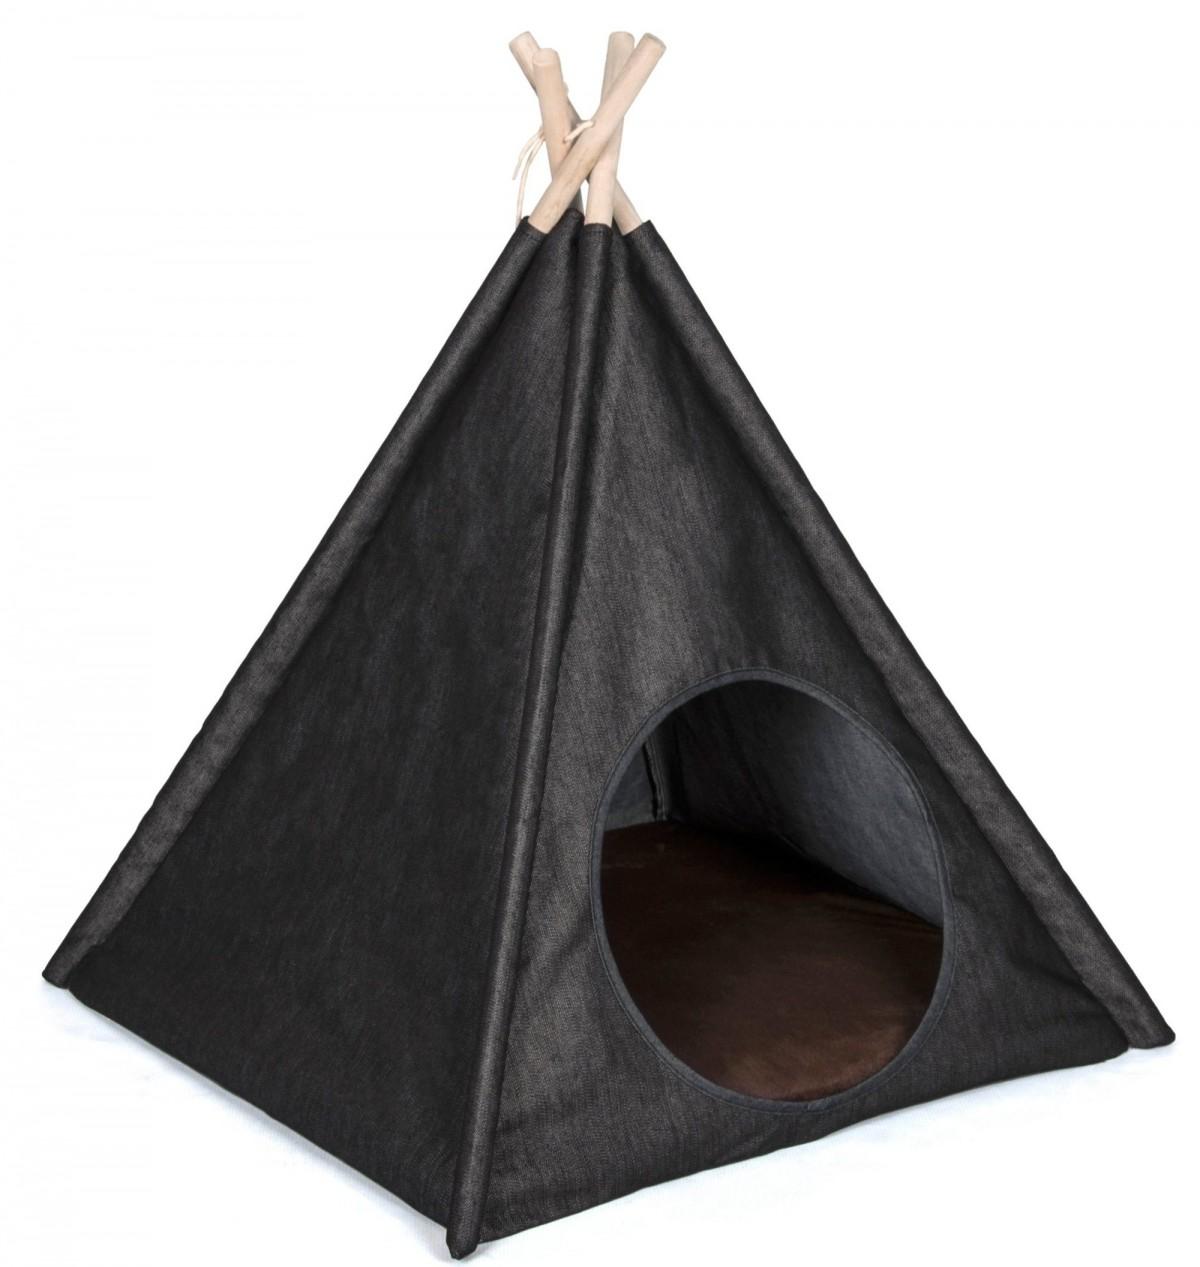 Cozy Denim Pet Tent